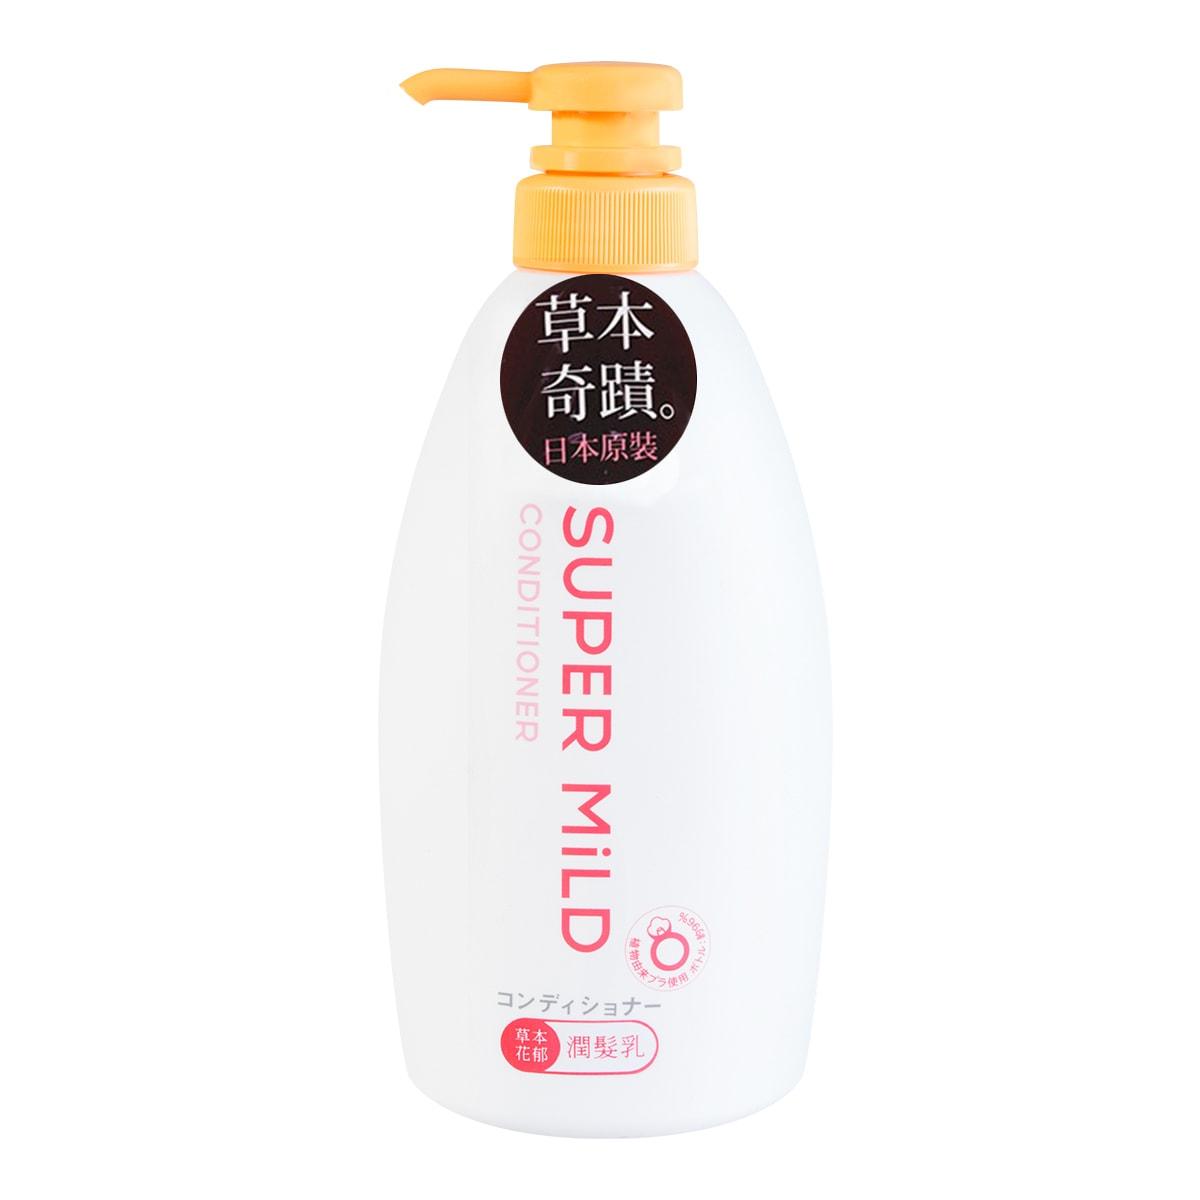 SHISEIDO SUPER MILD Conditioner Floral 600ml